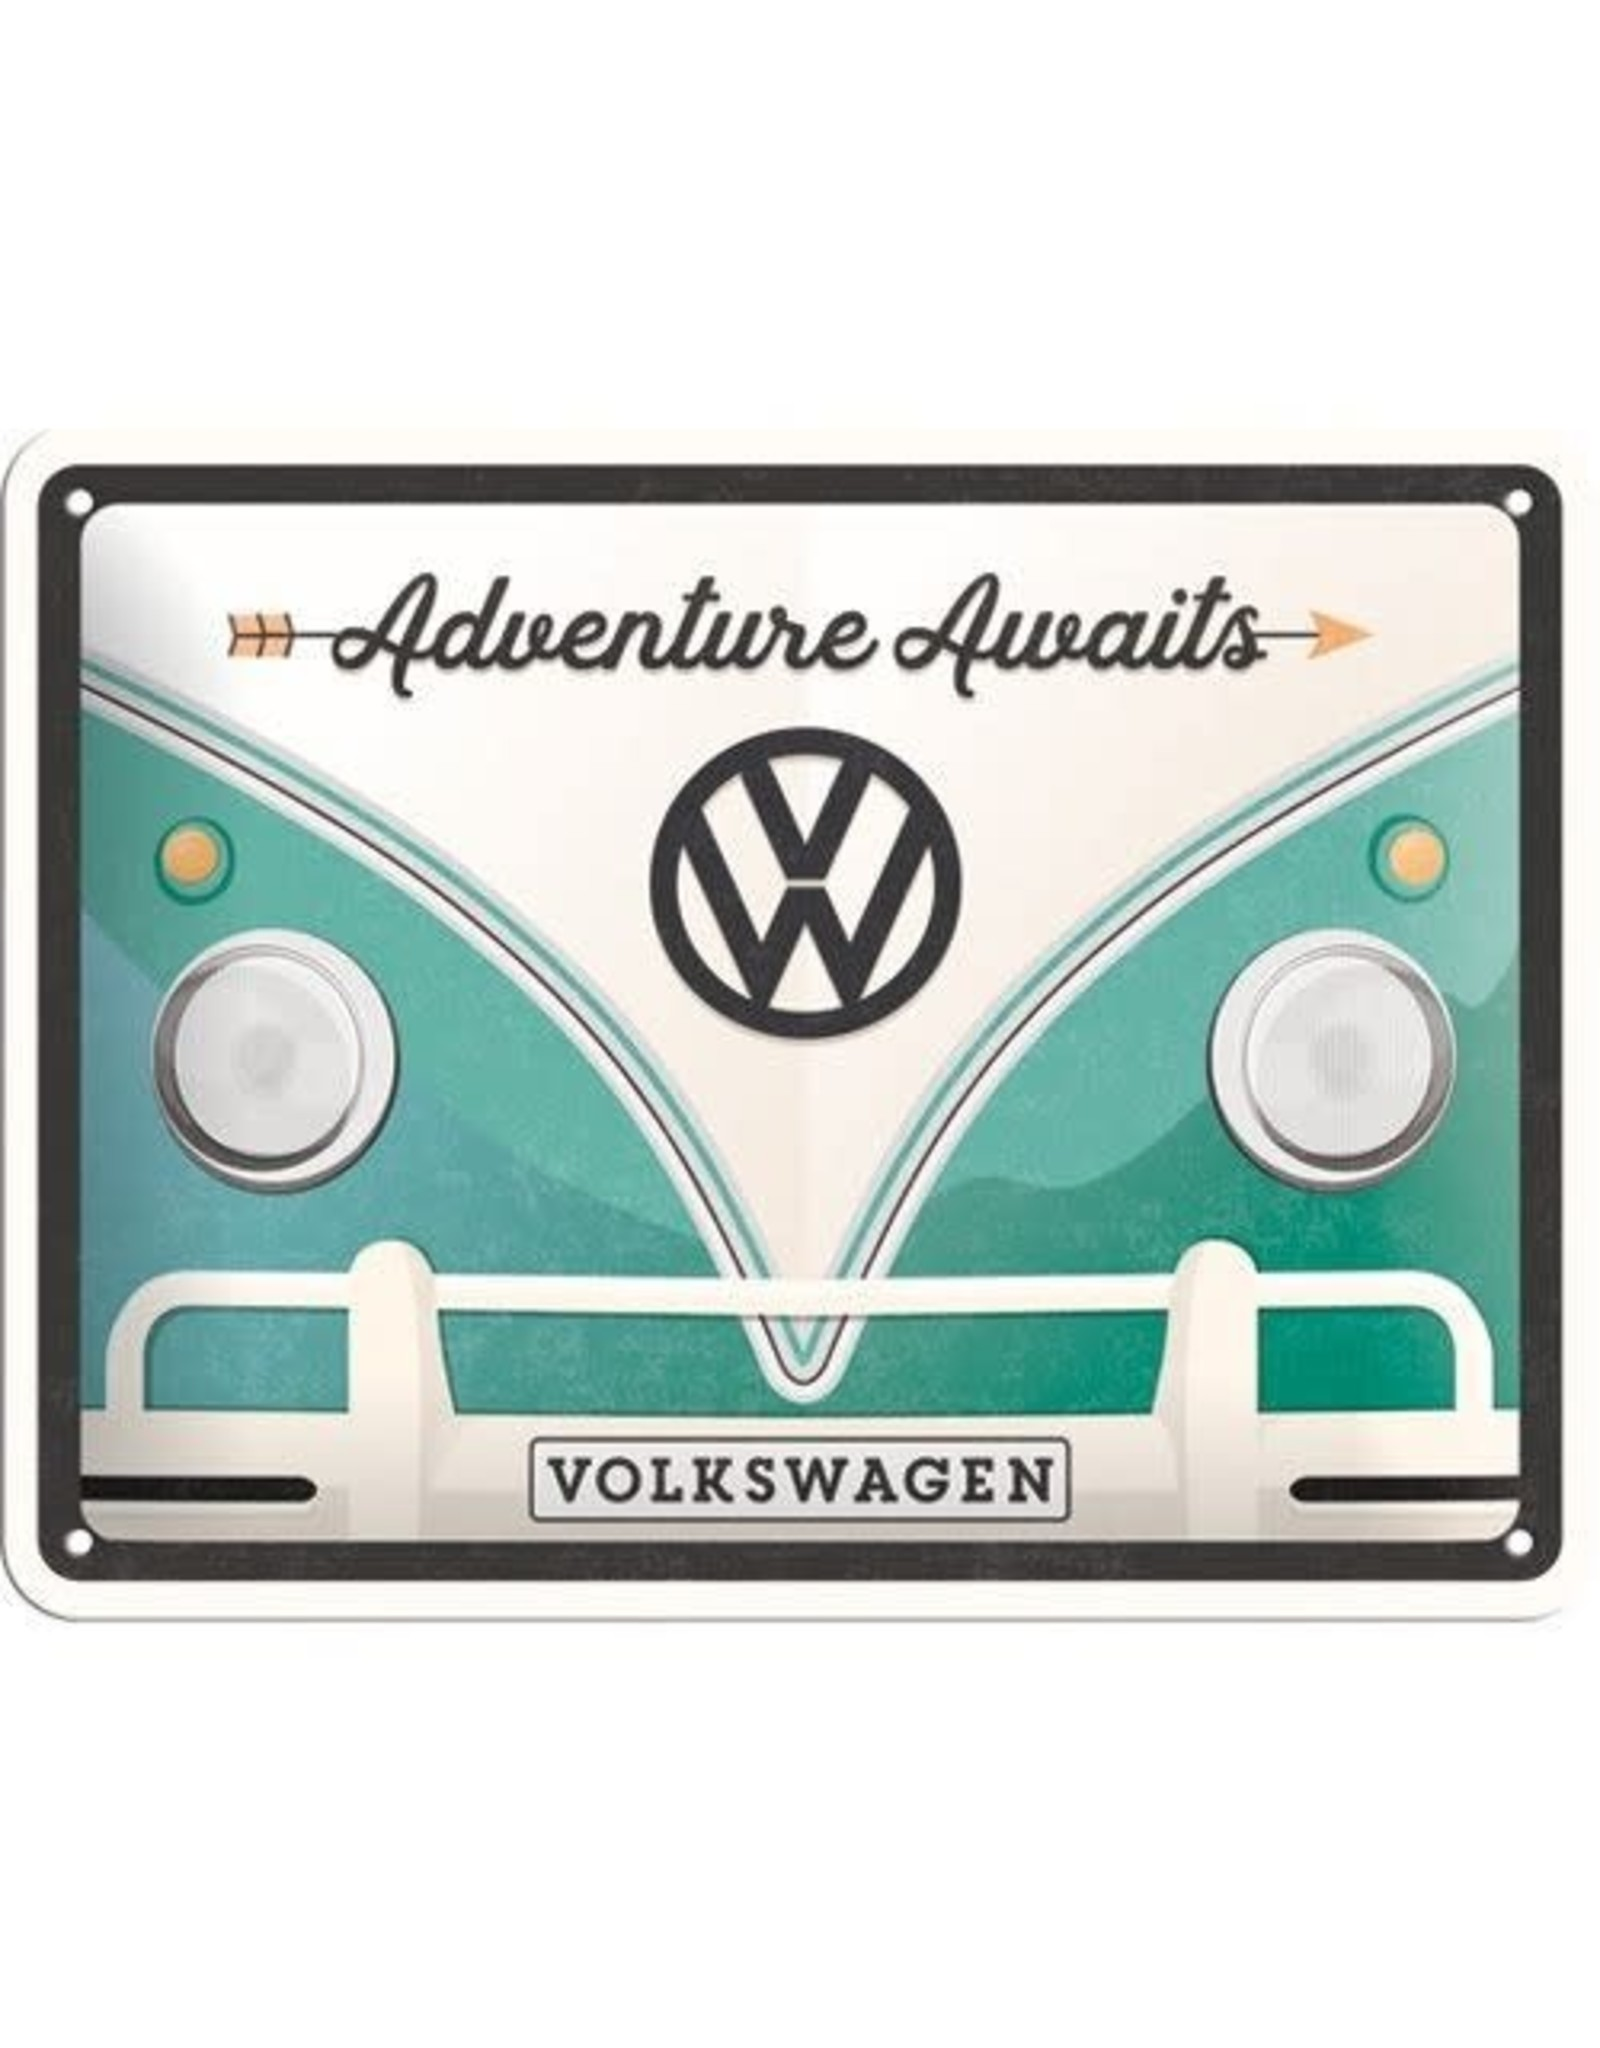 sign - 15x20 - VW adventure awaits